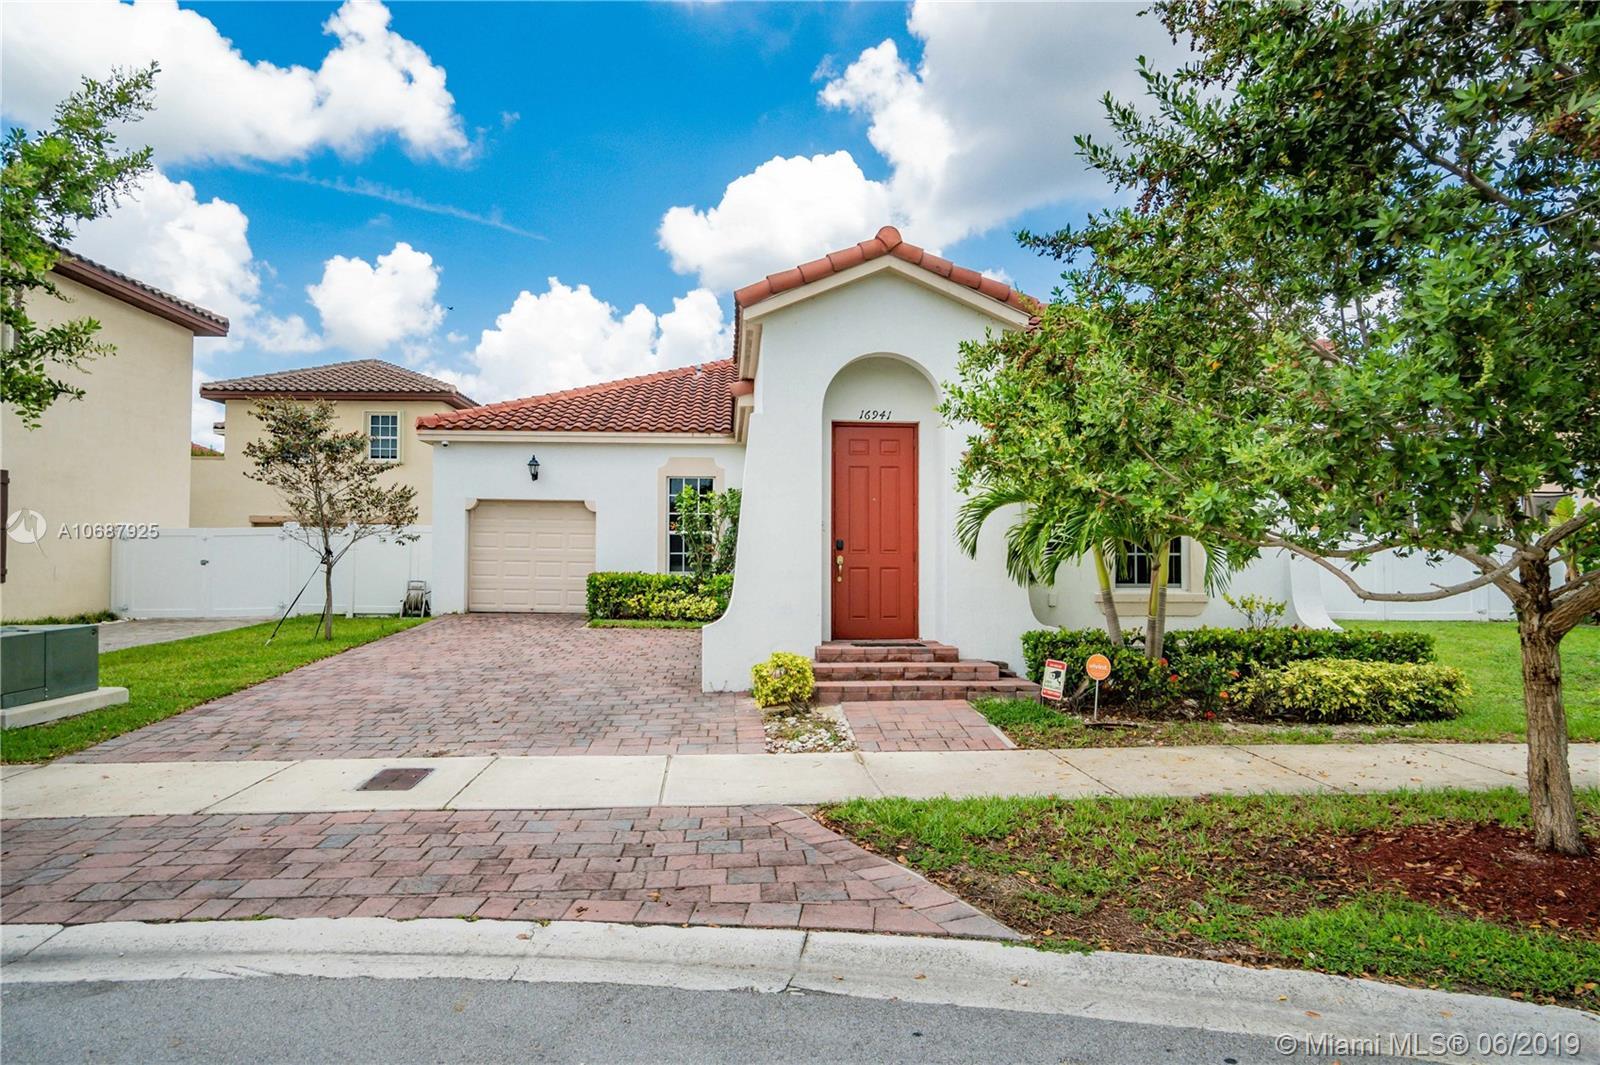 16941 SW 91st Lane Cir, Kendall FL 33196